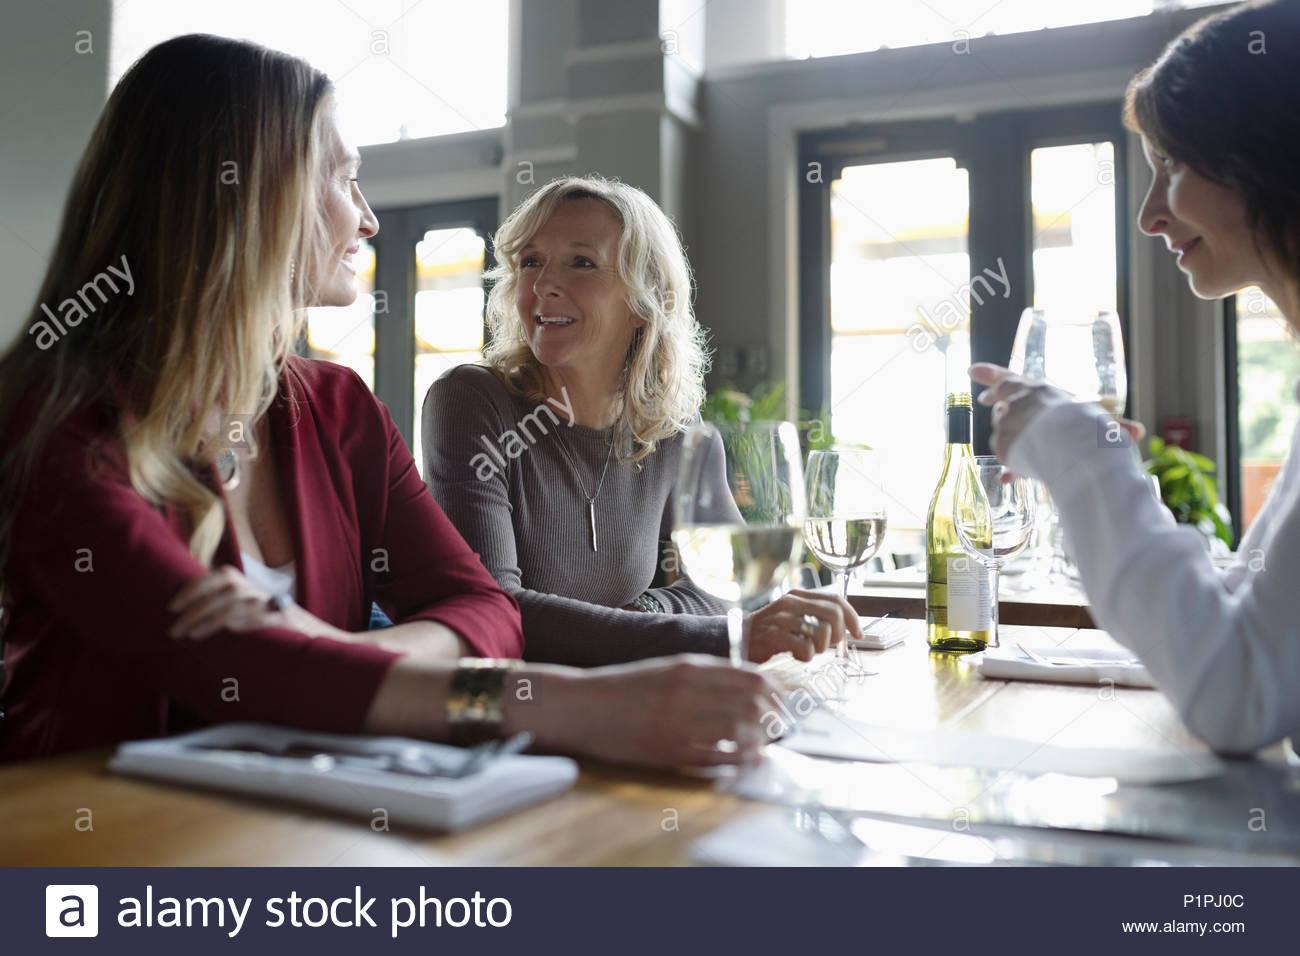 Les femmes de boire du vin, manger dans restaurant Photo Stock